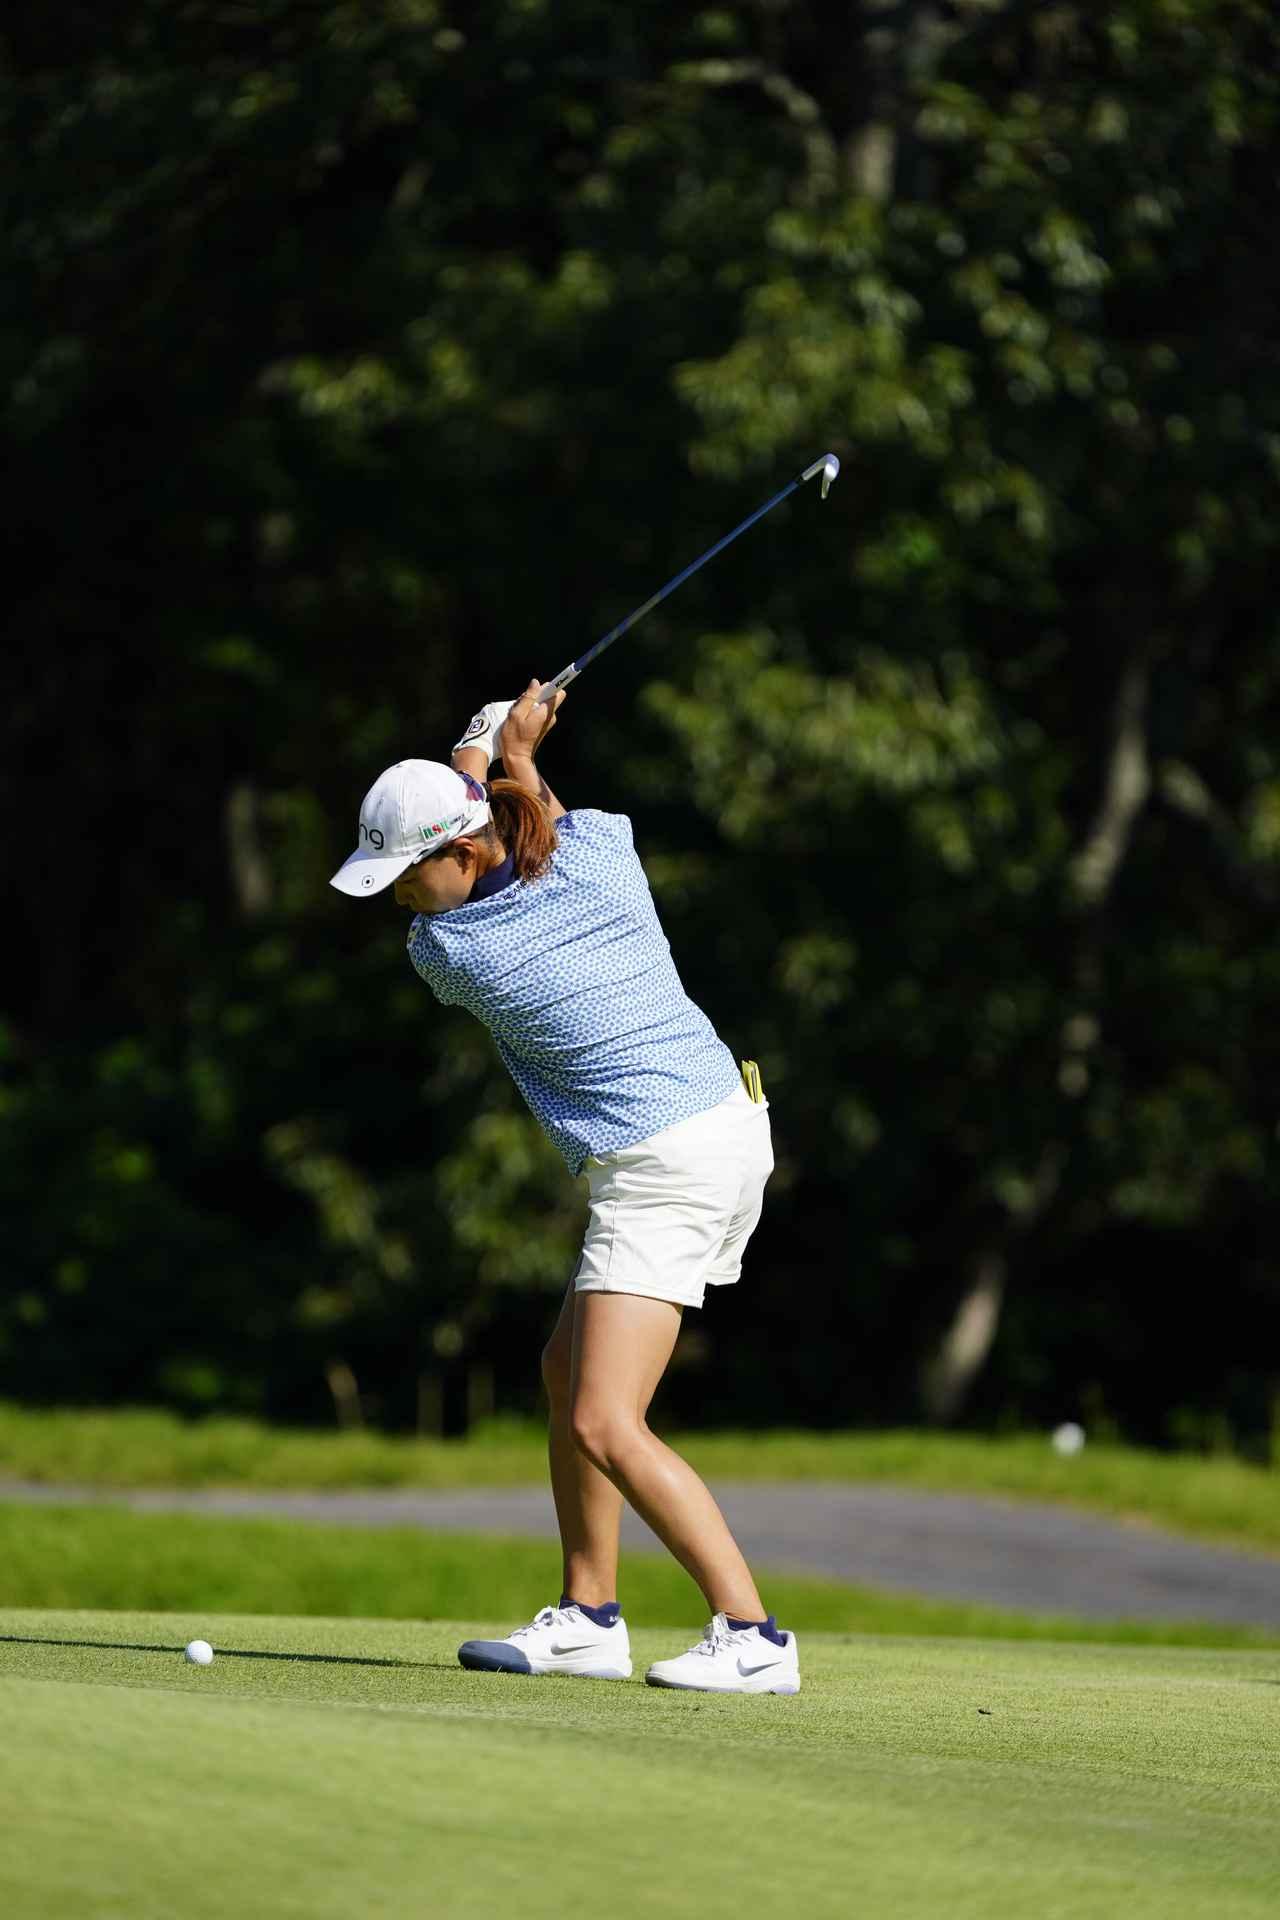 Images : 8番目の画像 - 渋野日向子 アイアン連続写真 - みんなのゴルフダイジェスト